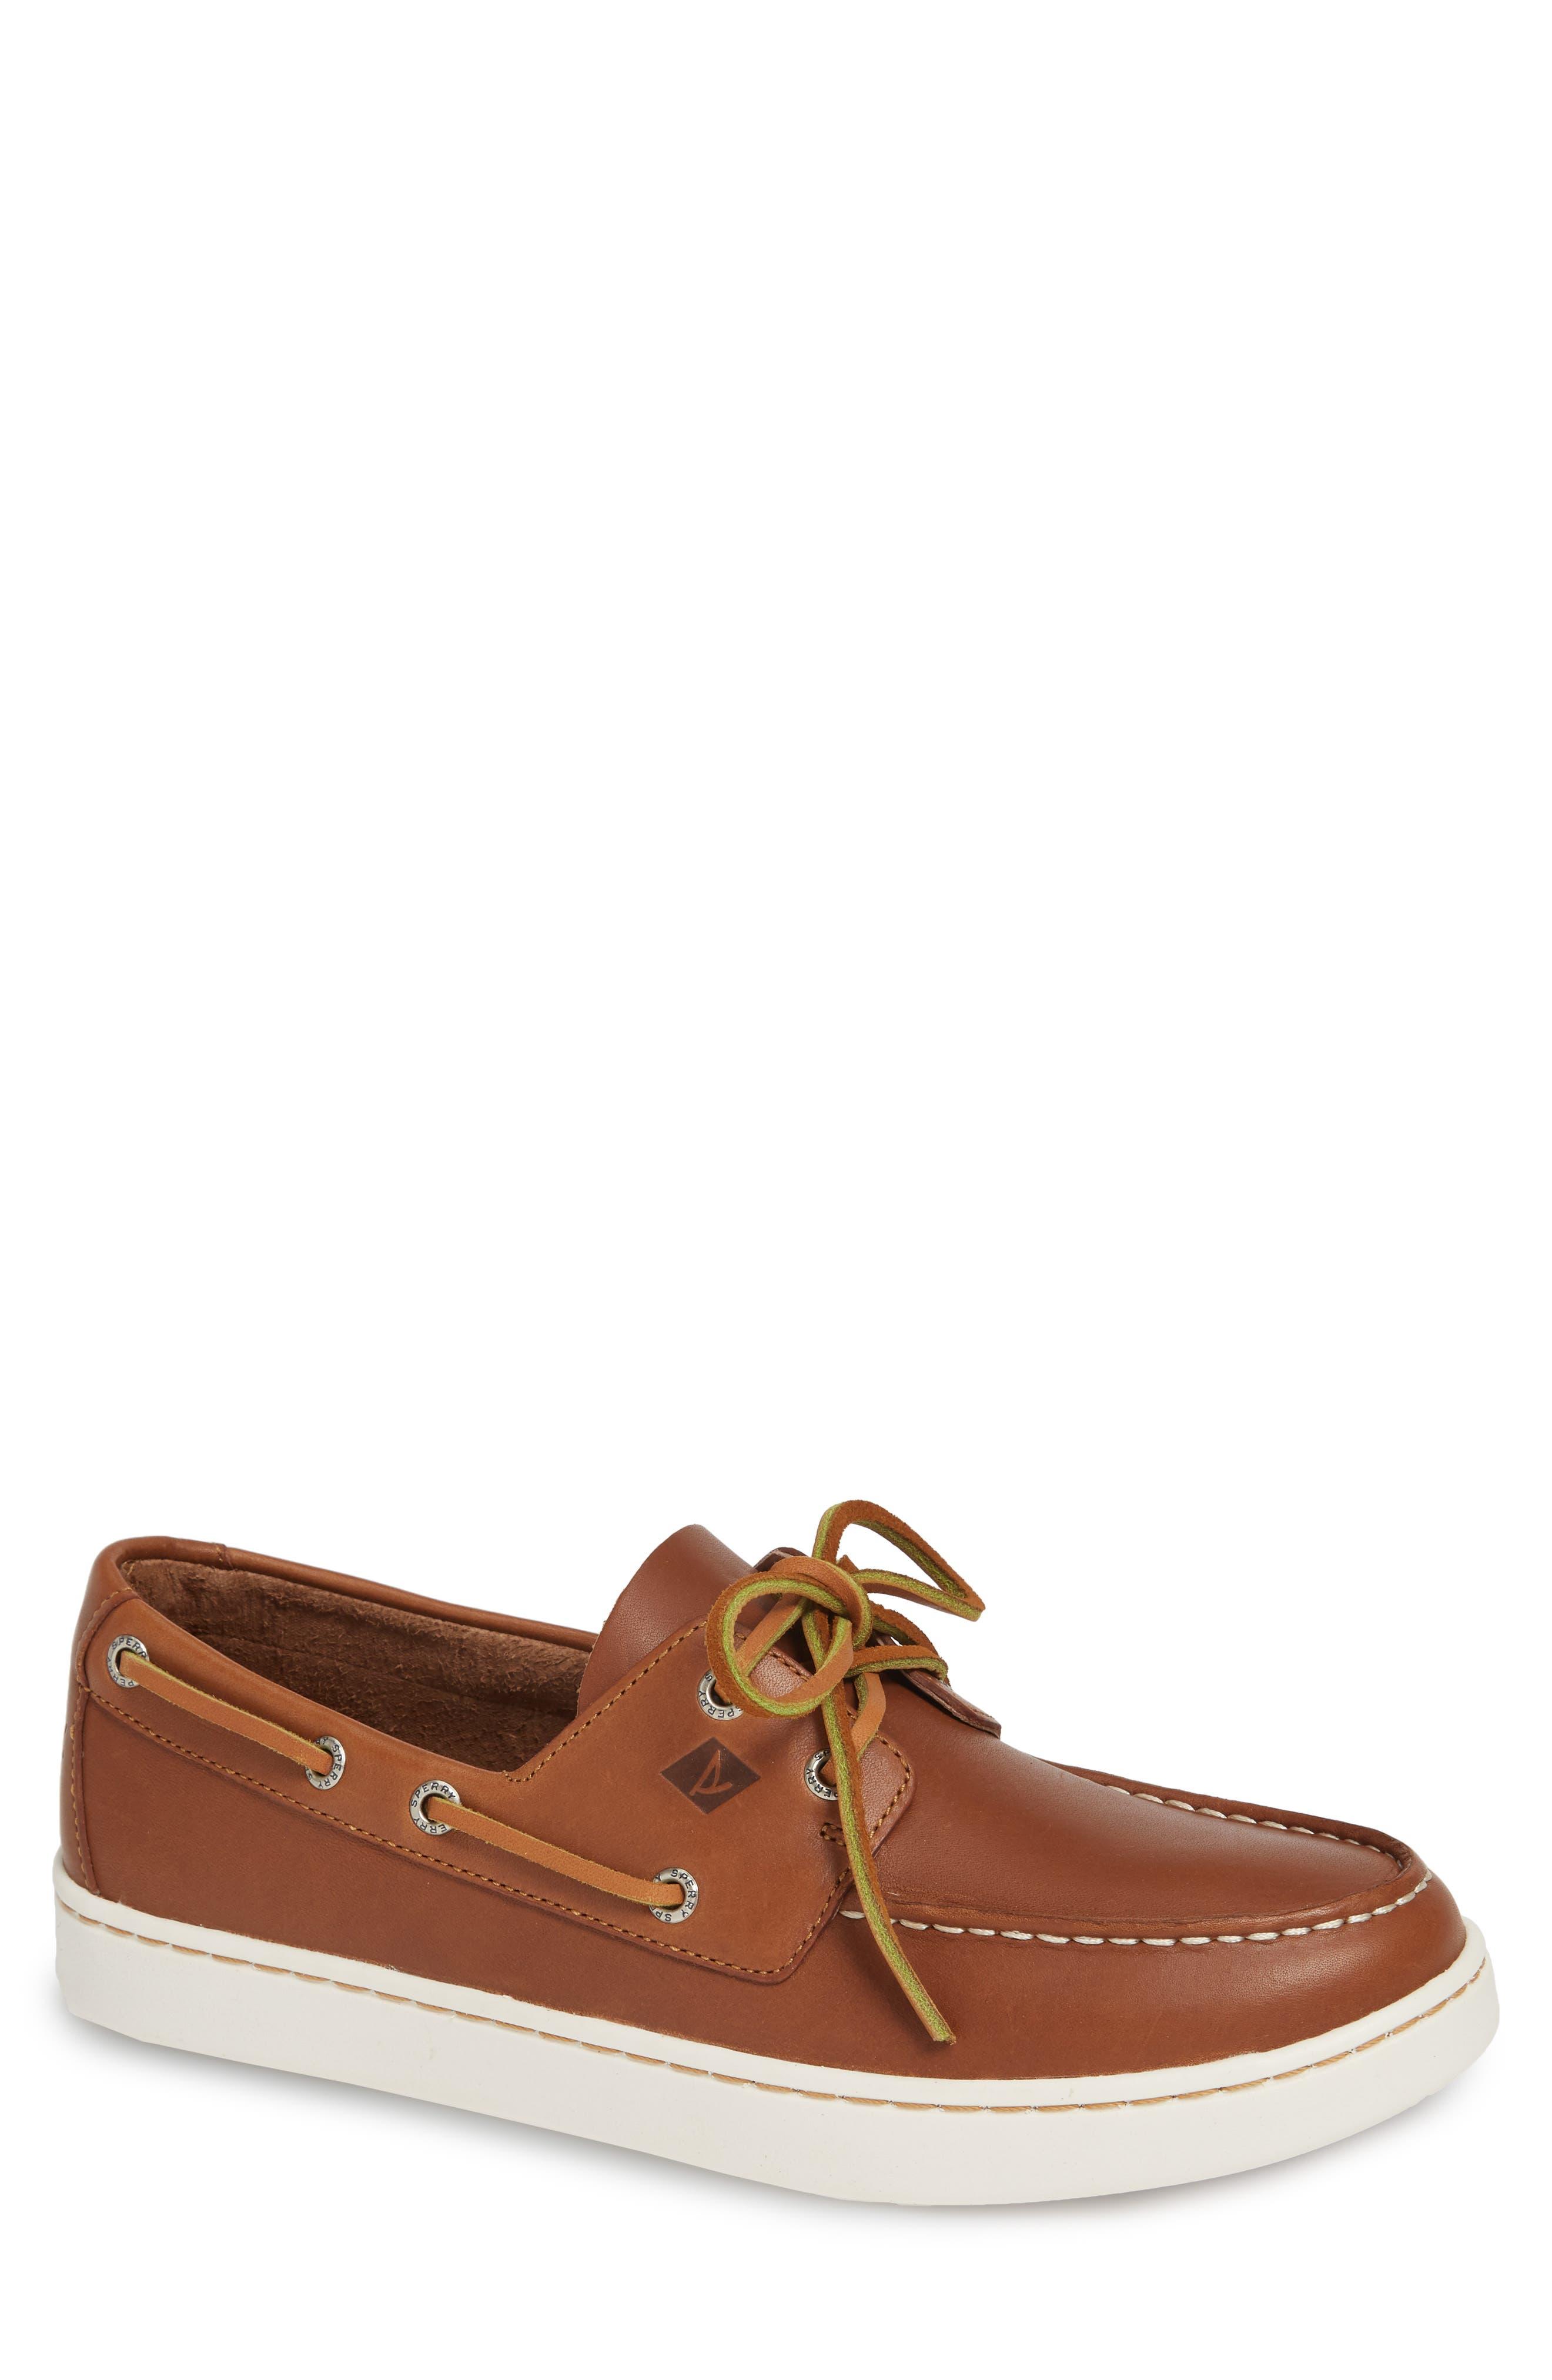 Cup Boat Shoe,                             Main thumbnail 1, color,                             TAN